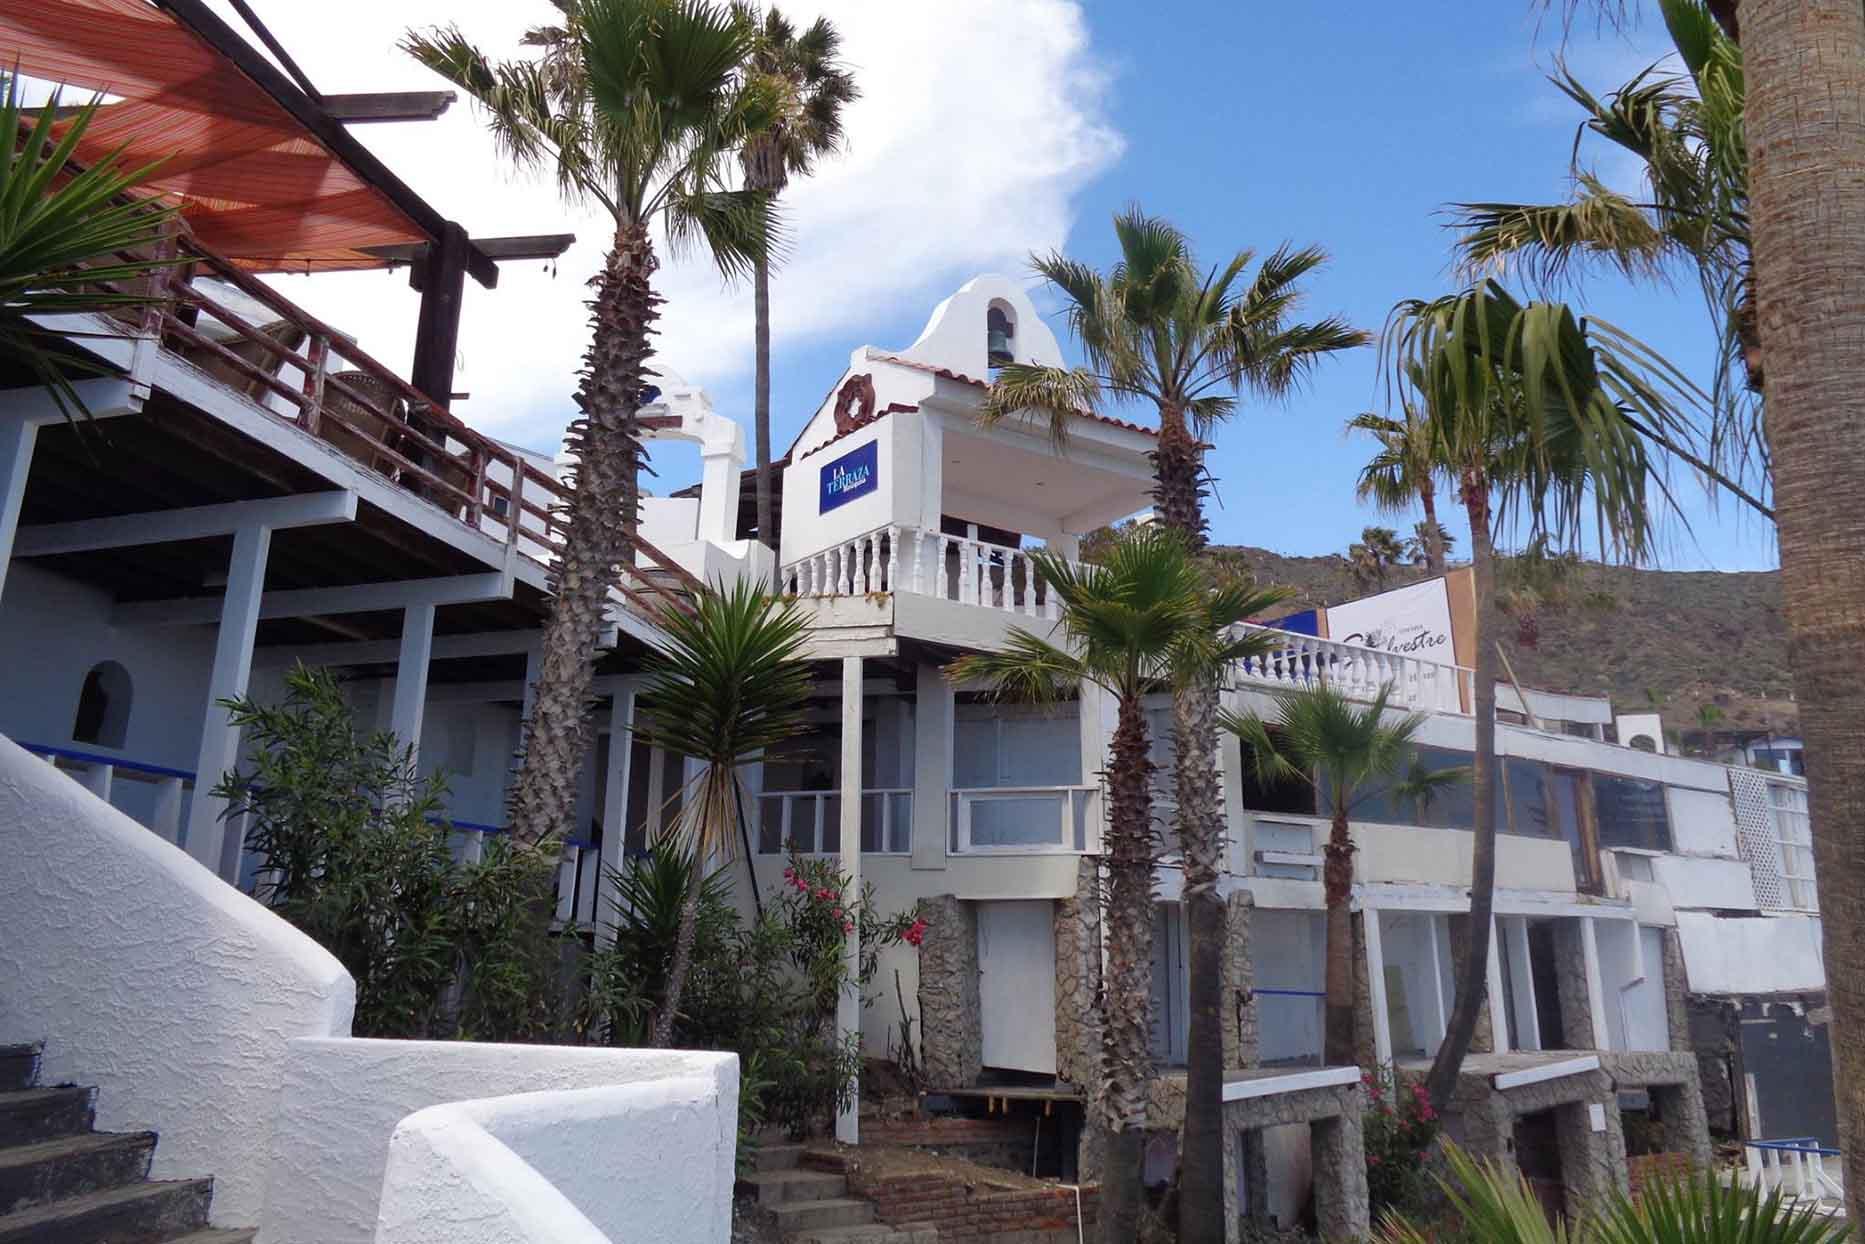 Hotel Calafia vista